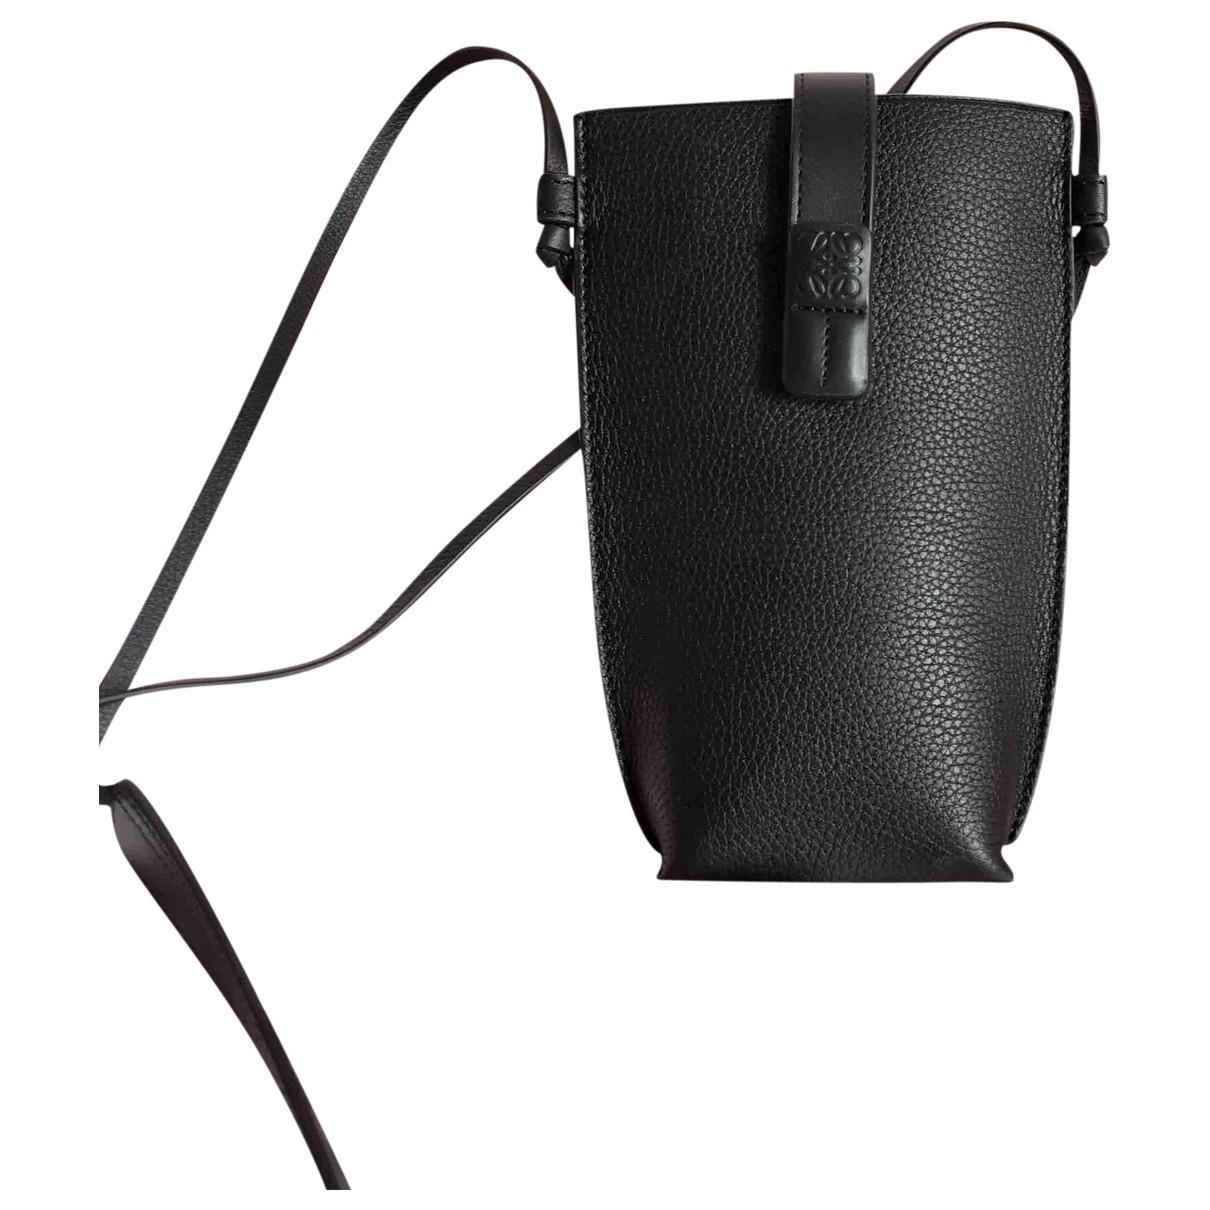 Loewe \N Black Leather Clutch bag for Women \N